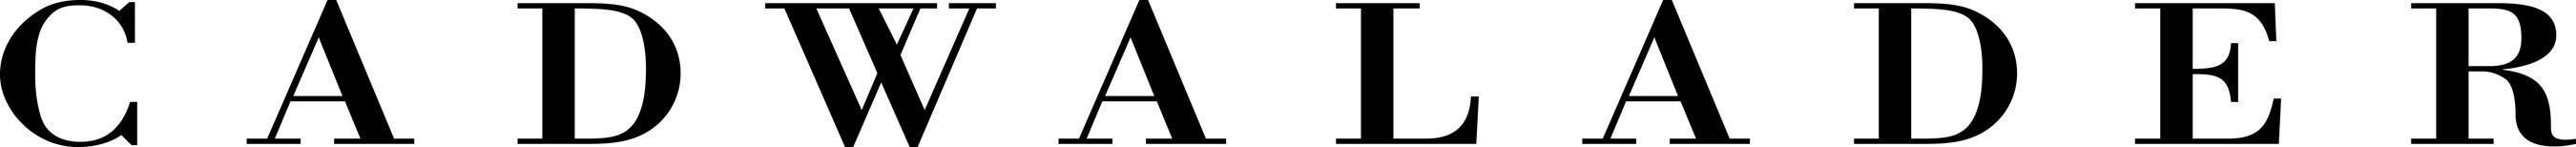 Cadwalader, Wickersham & Taft Logo